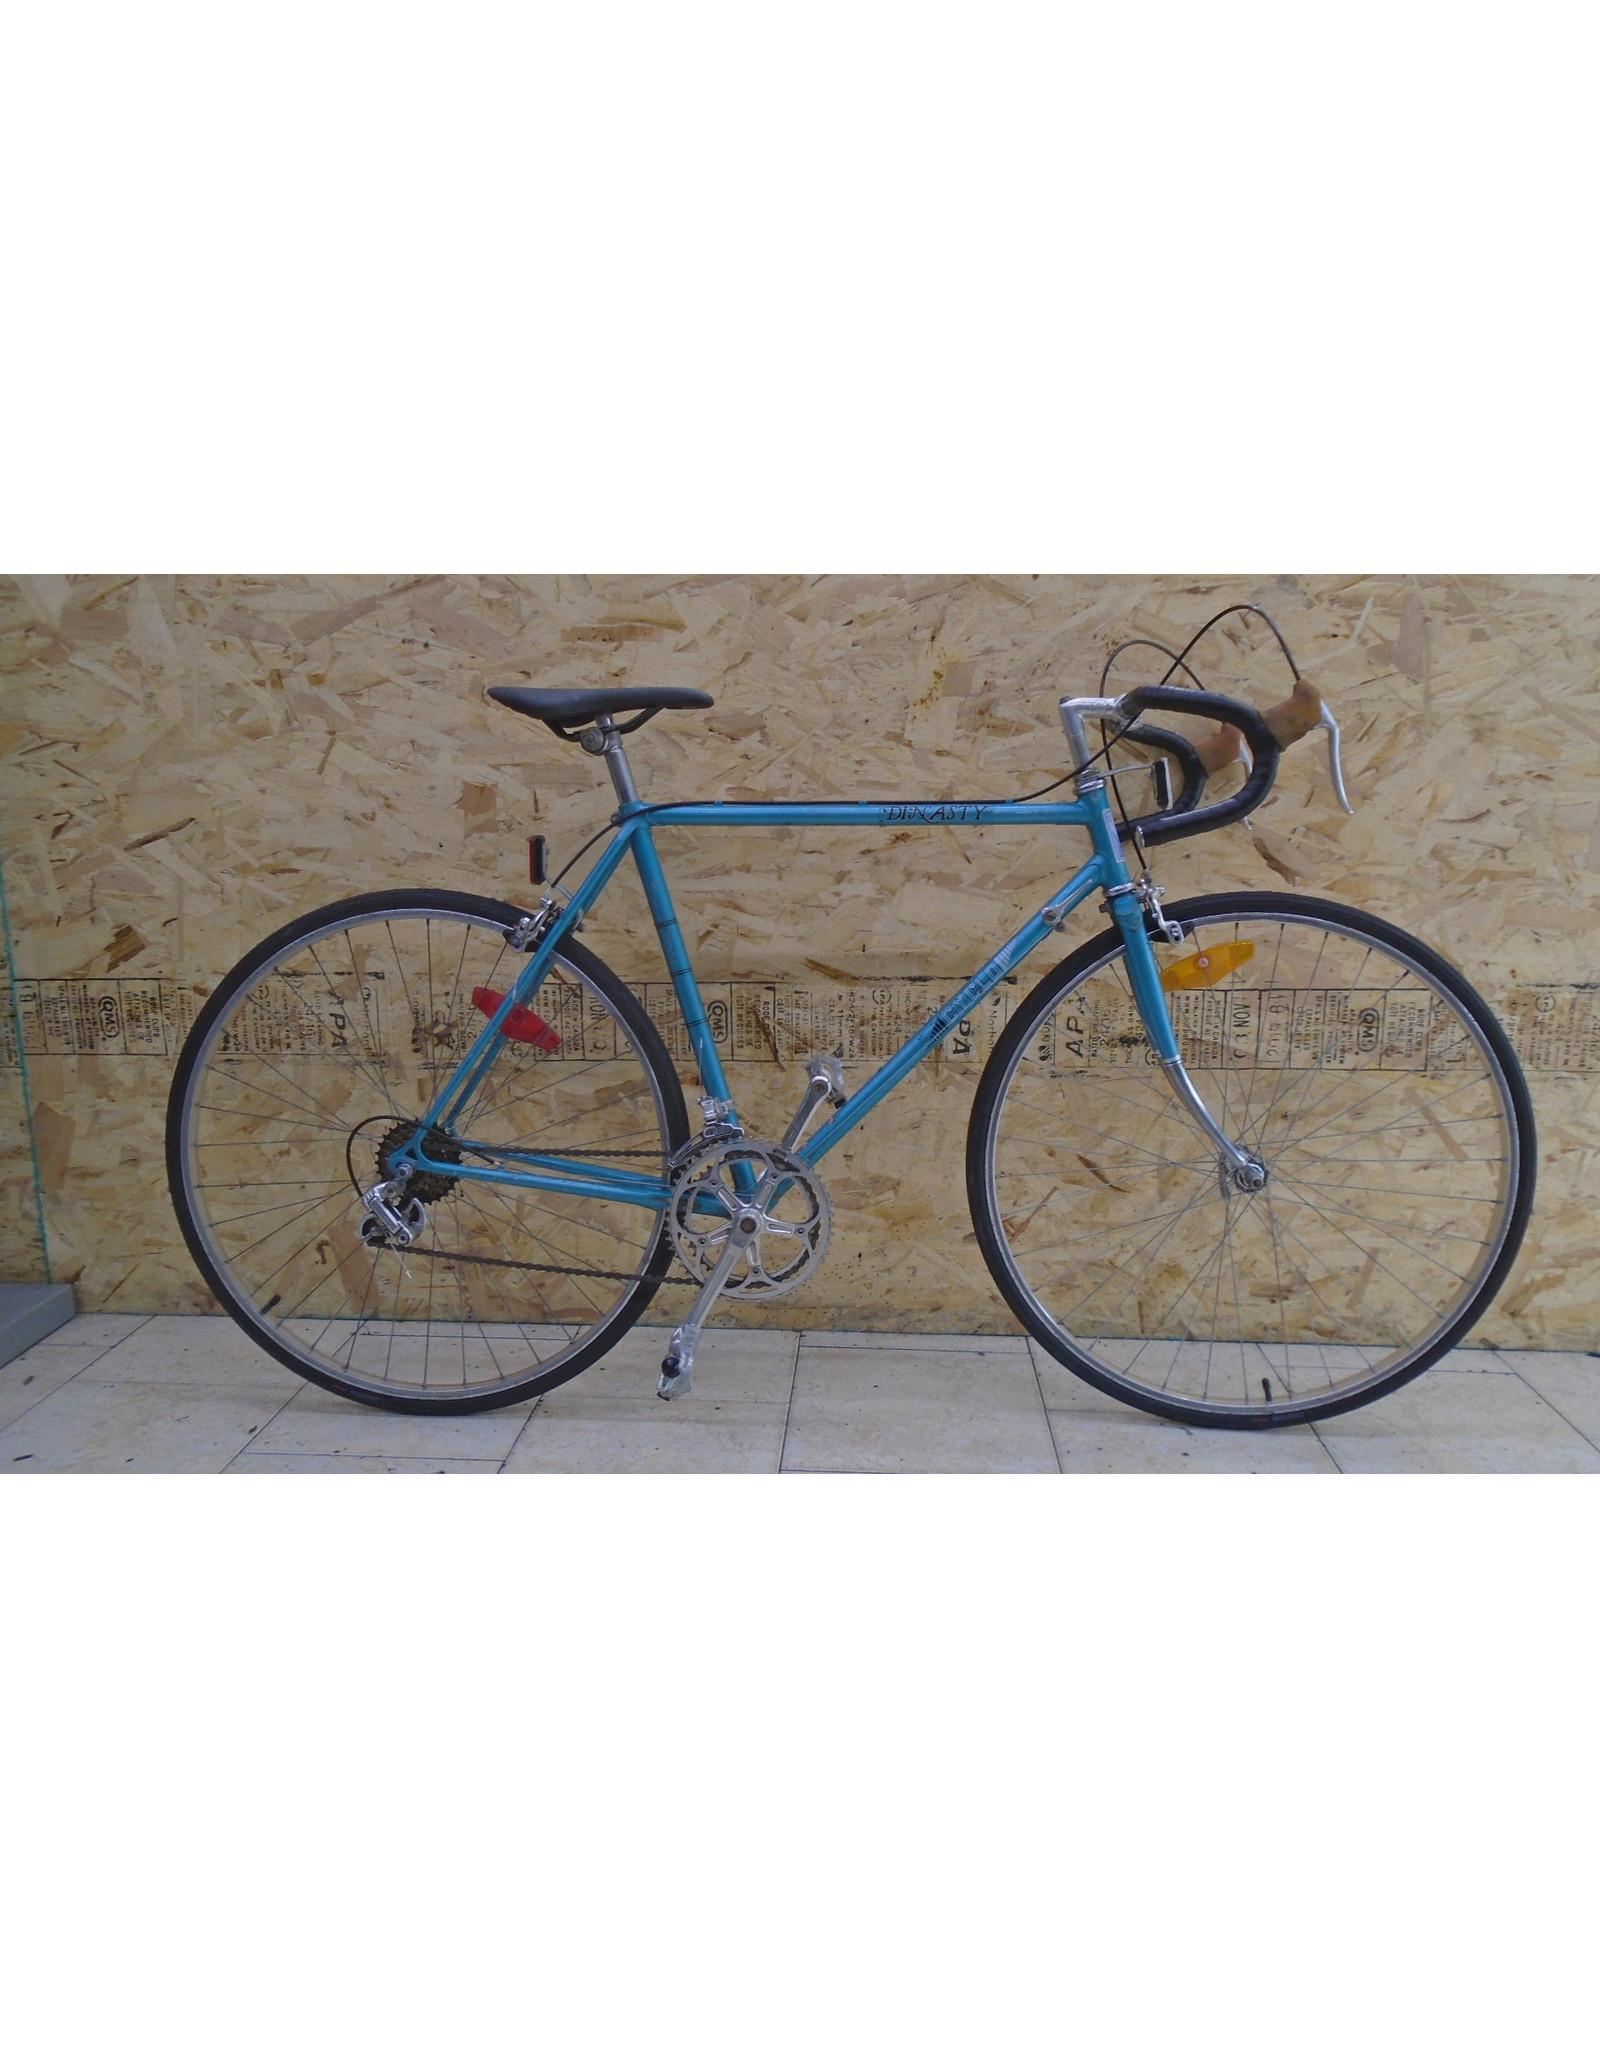 "Vélo usagé de route Cyclo 21"" - 9921"